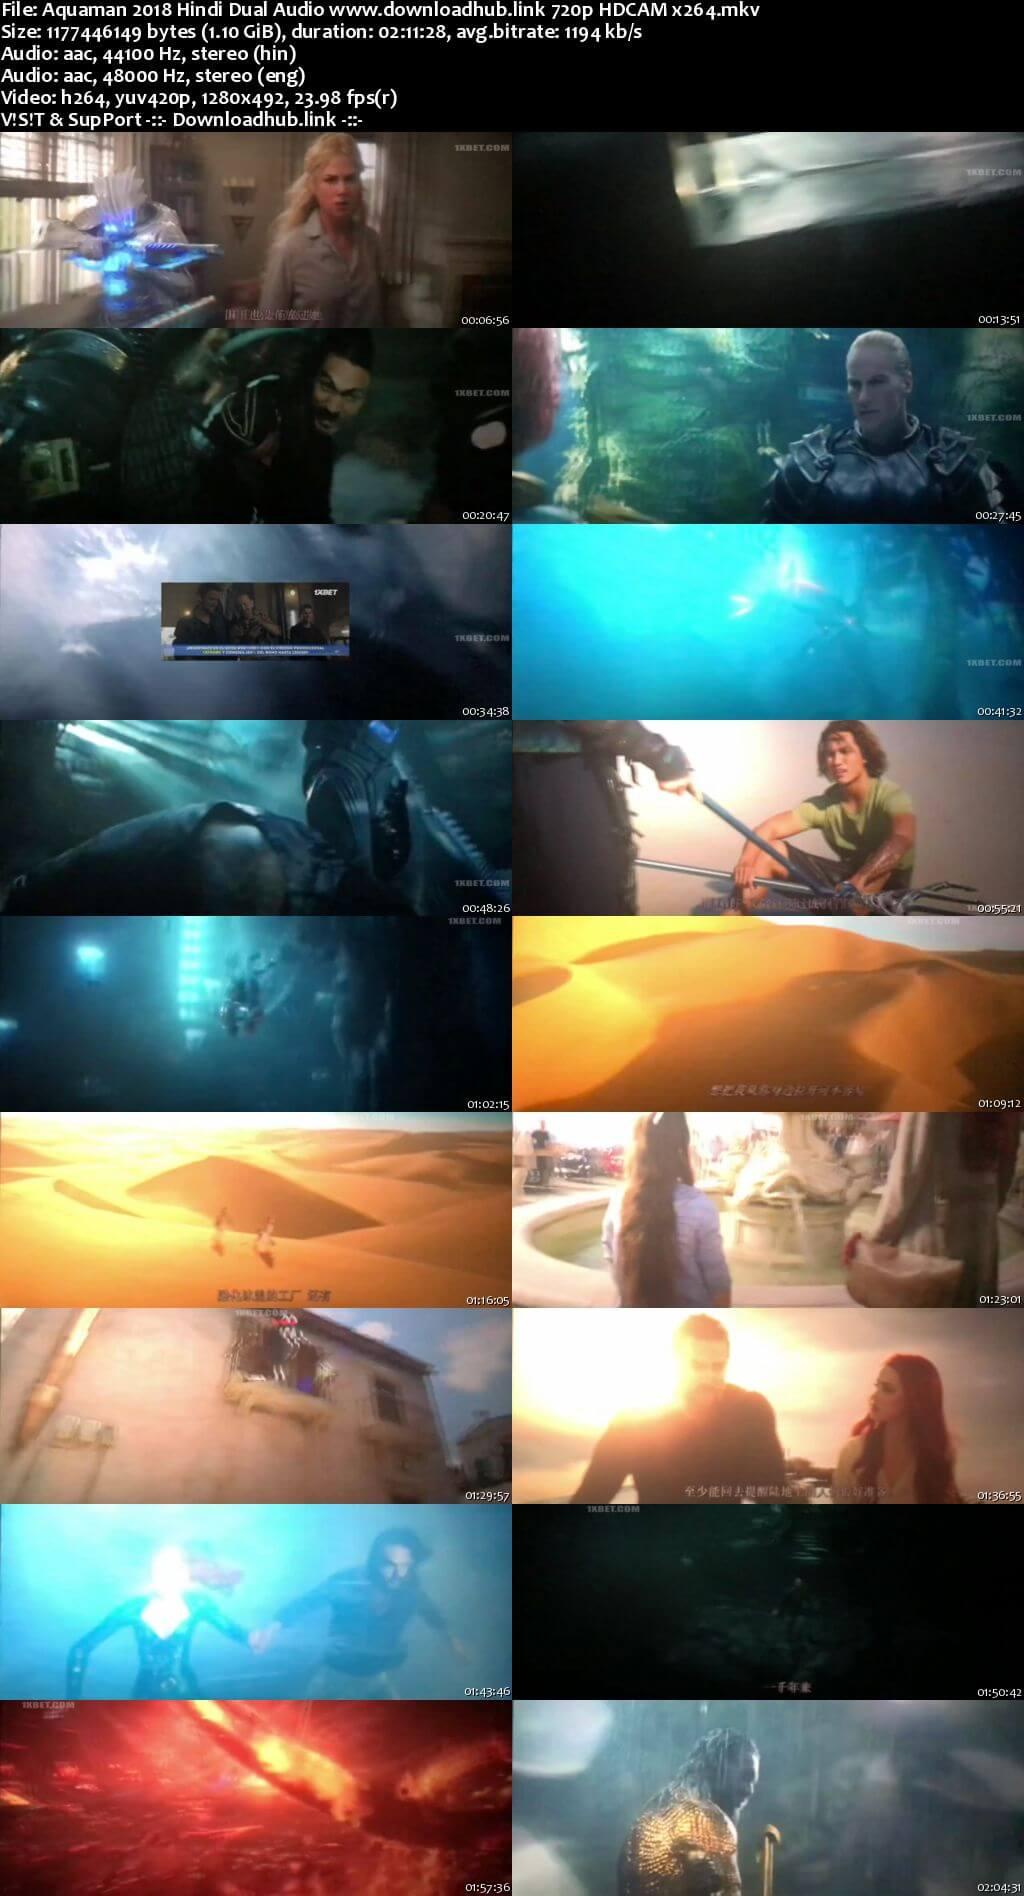 Aquaman 2018 Hindi Dual Audio 720p HDCAM x264